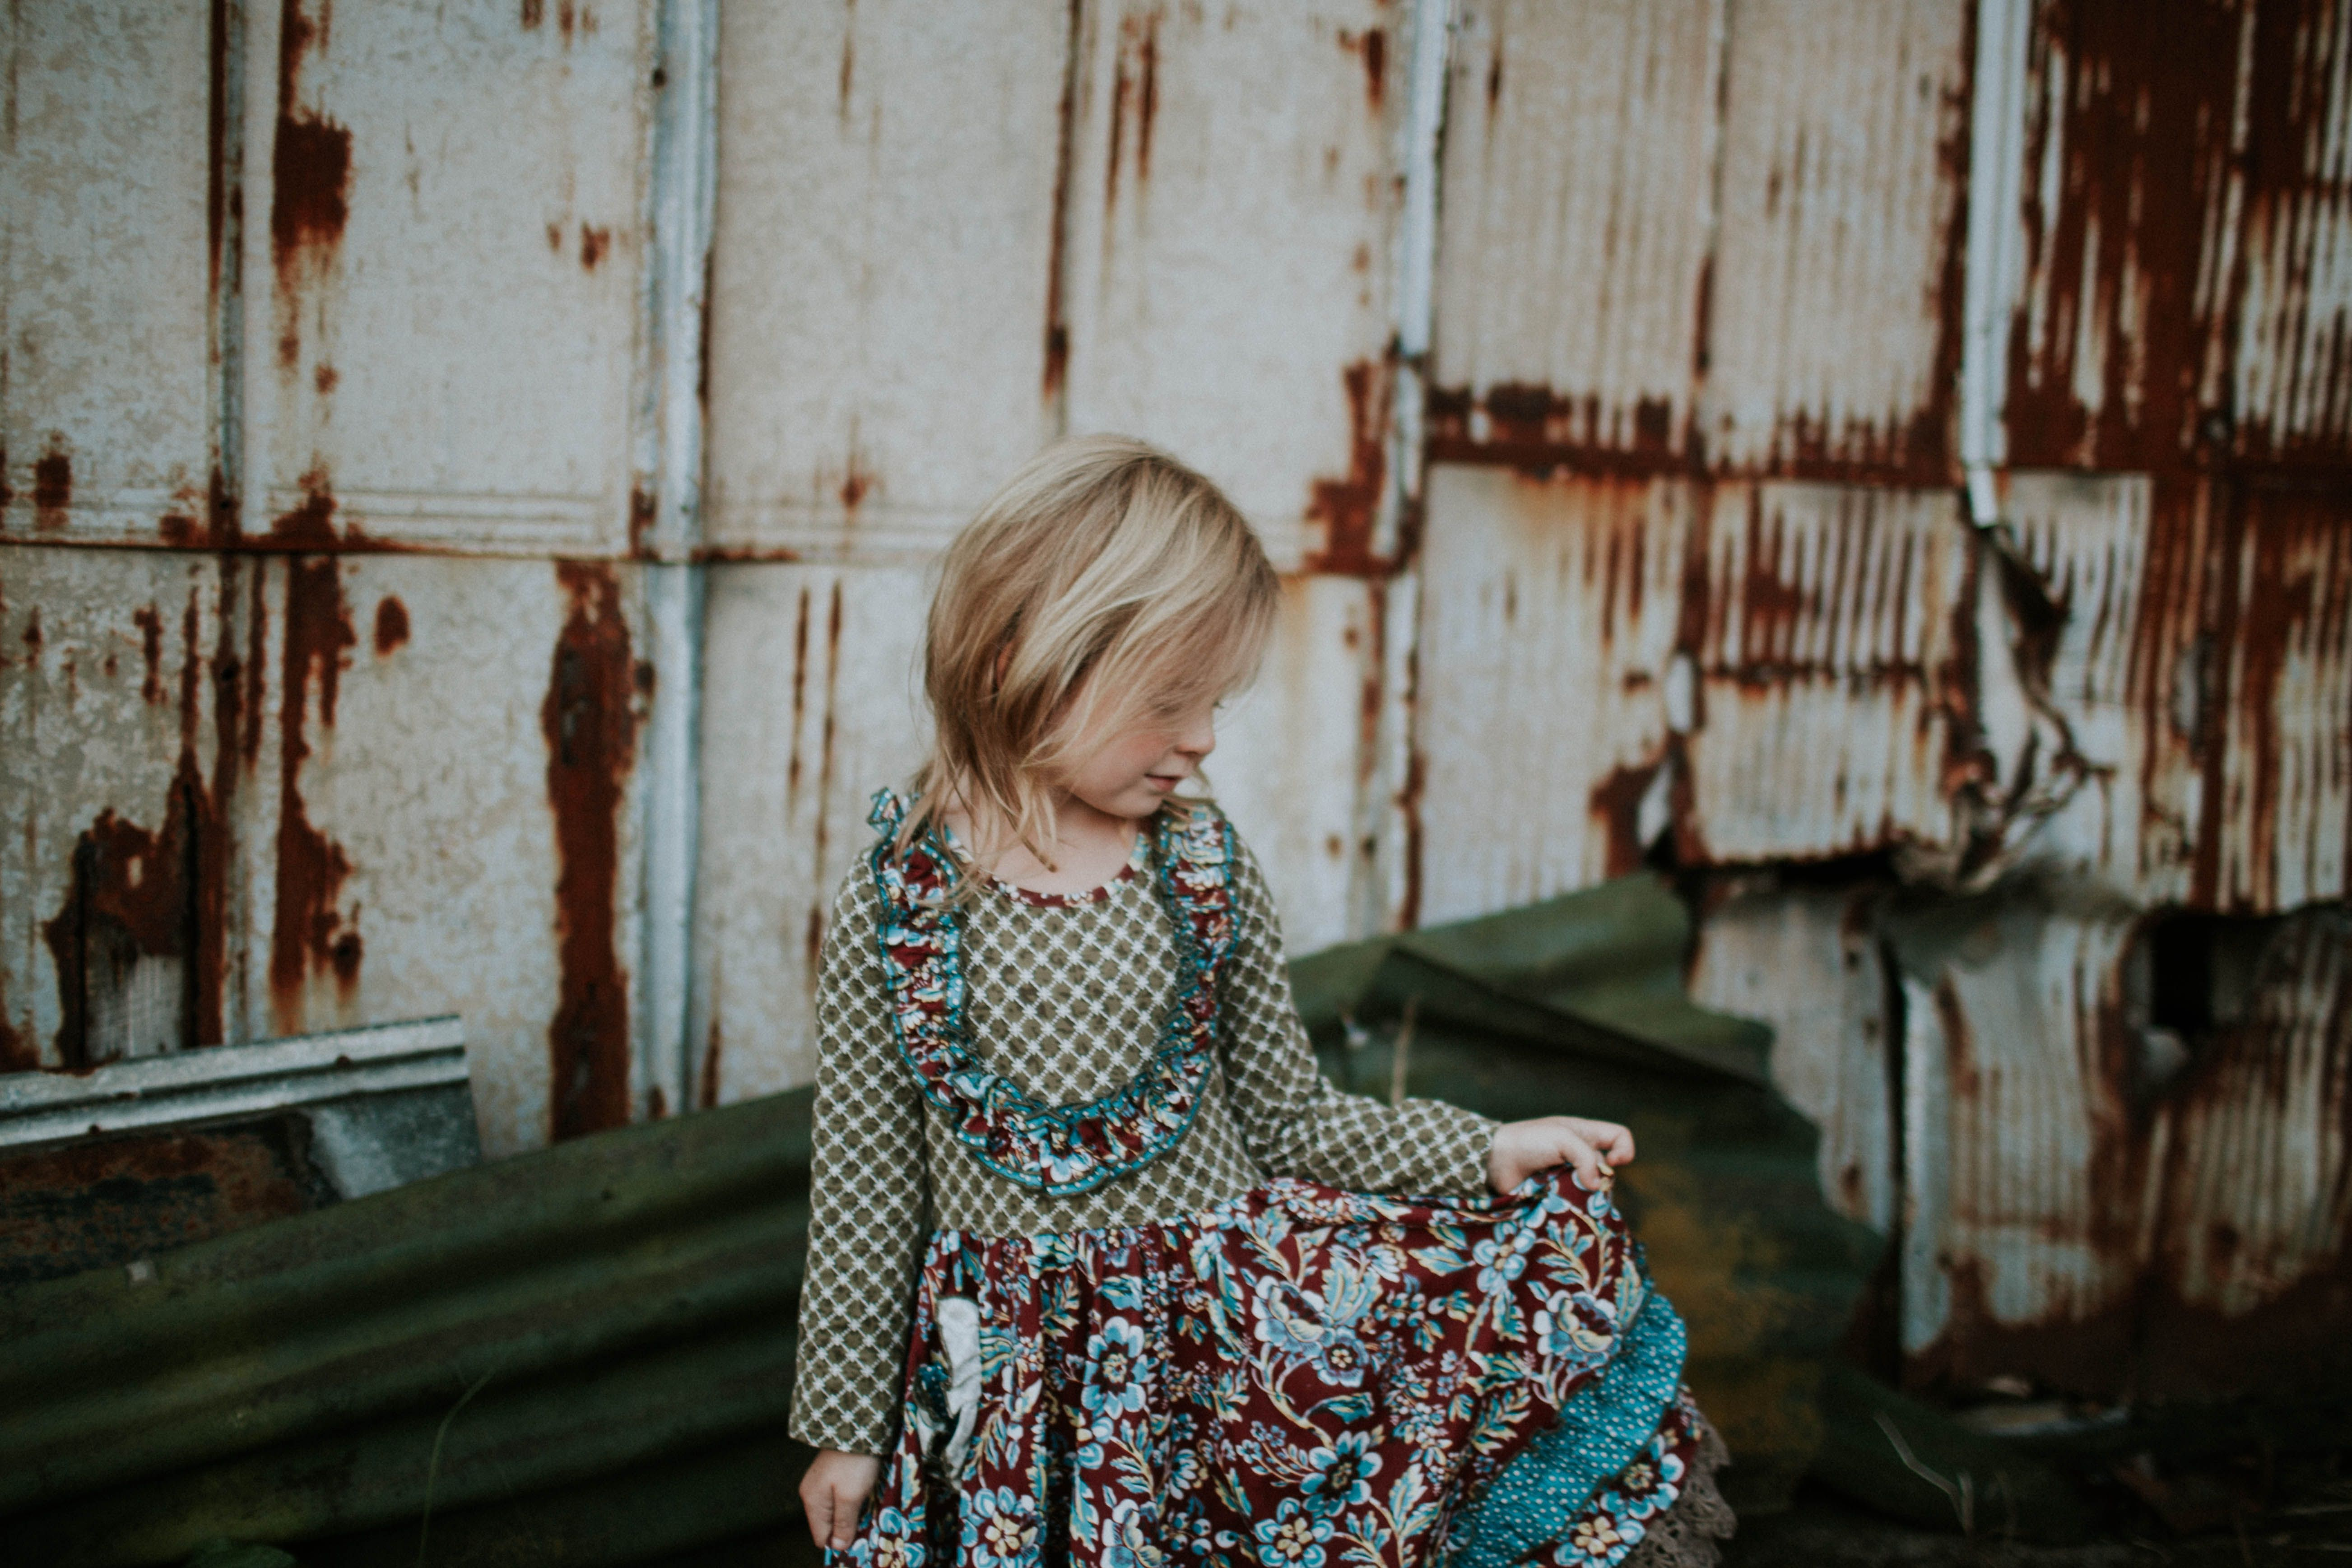 Mustard pie clothing 2016  Shalon Blackwell Photography  Fall photo shoot  Child model